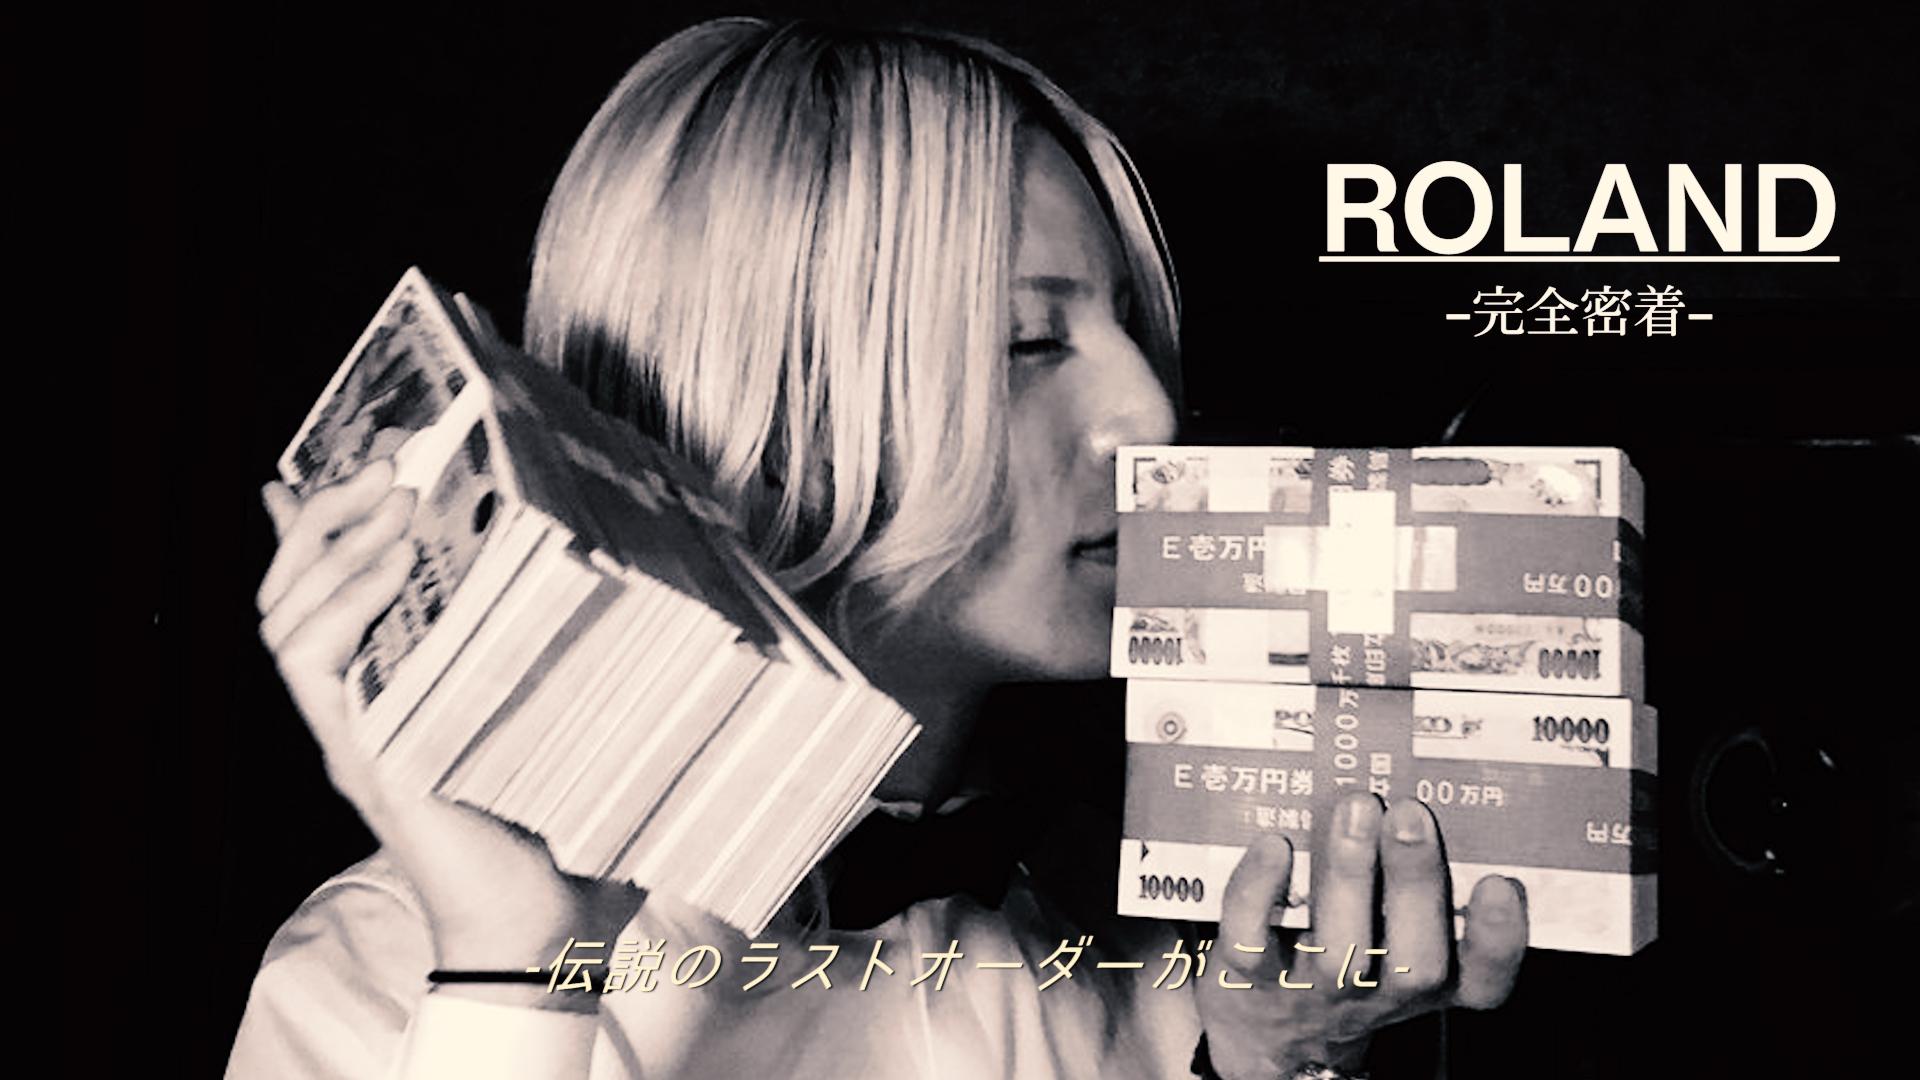 ROLAND,完全密着, vol.002[KG,PRODUCE] HOST,TV.com/動画